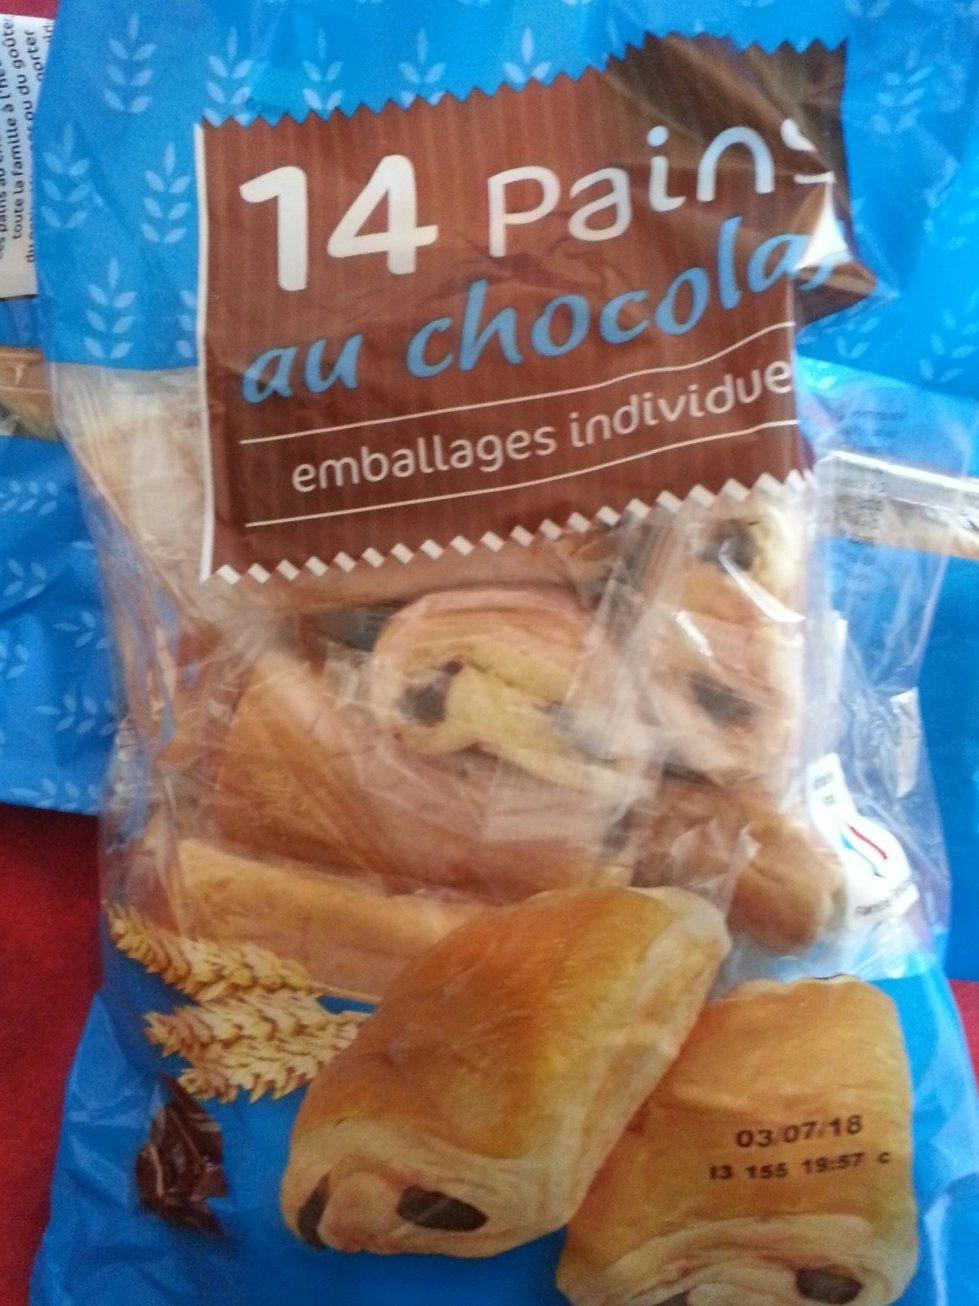 Pains au chocolat x14 - Product - fr